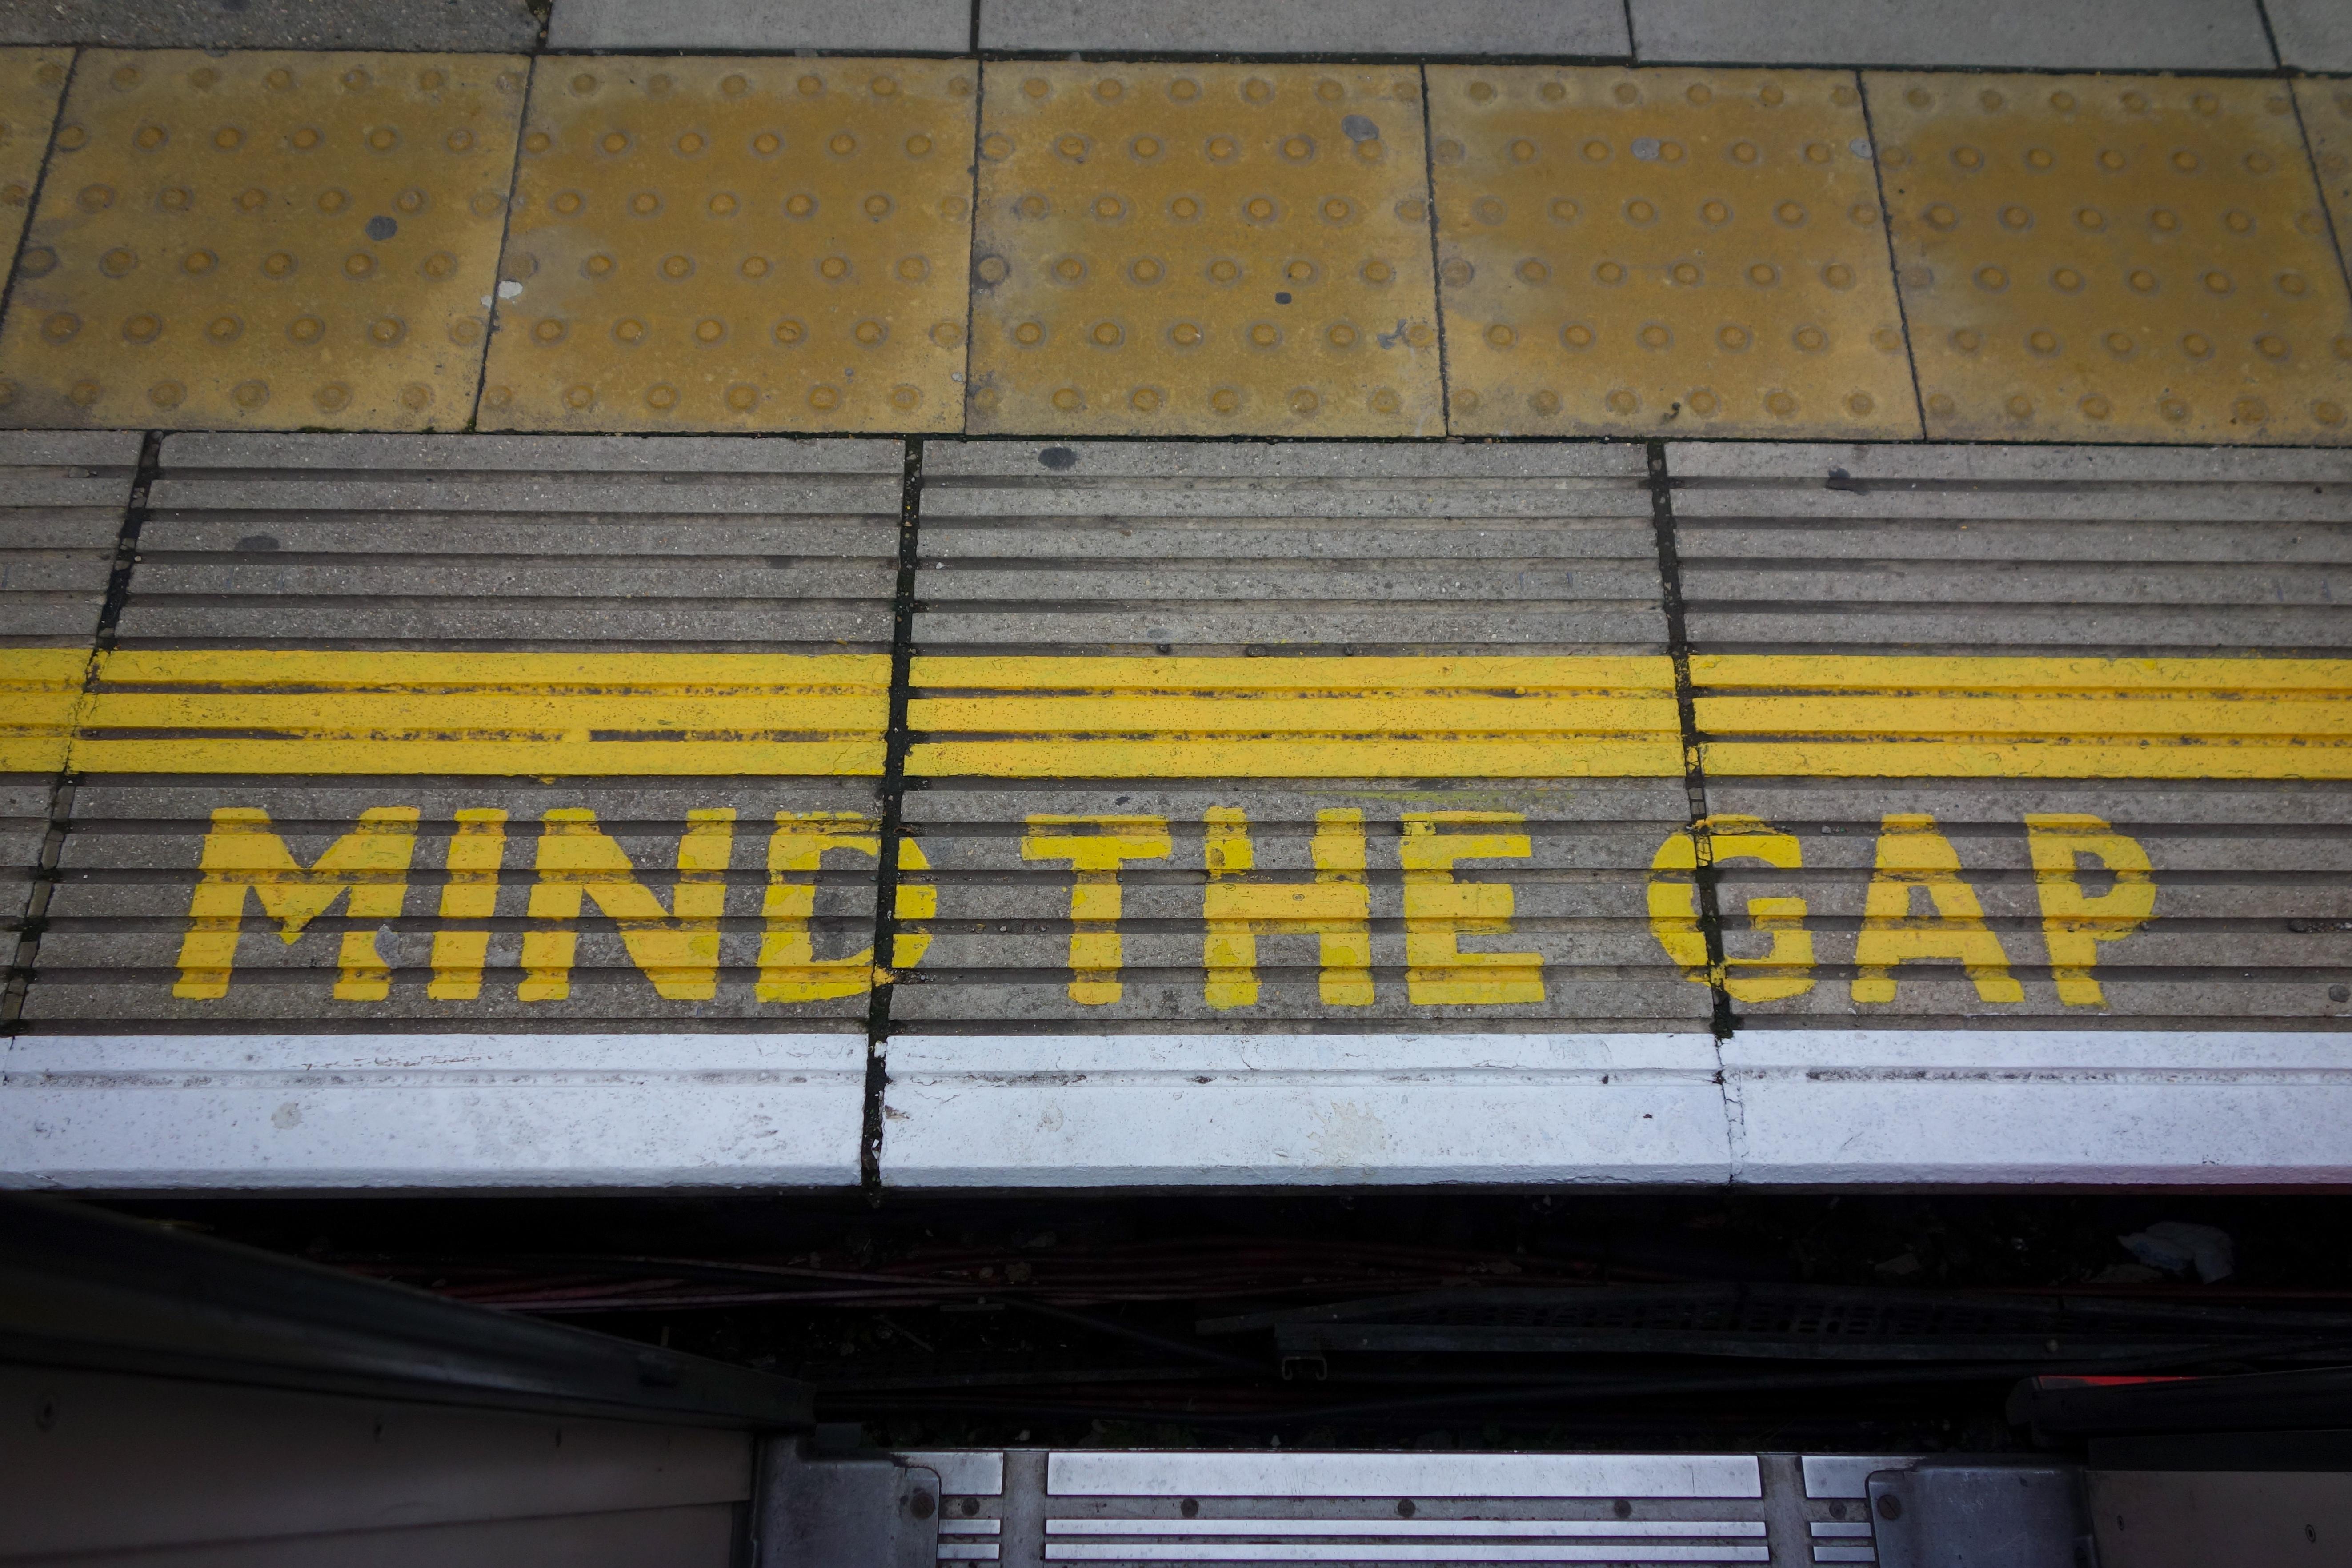 OpenStack's next mission: bridging the gaps between open source